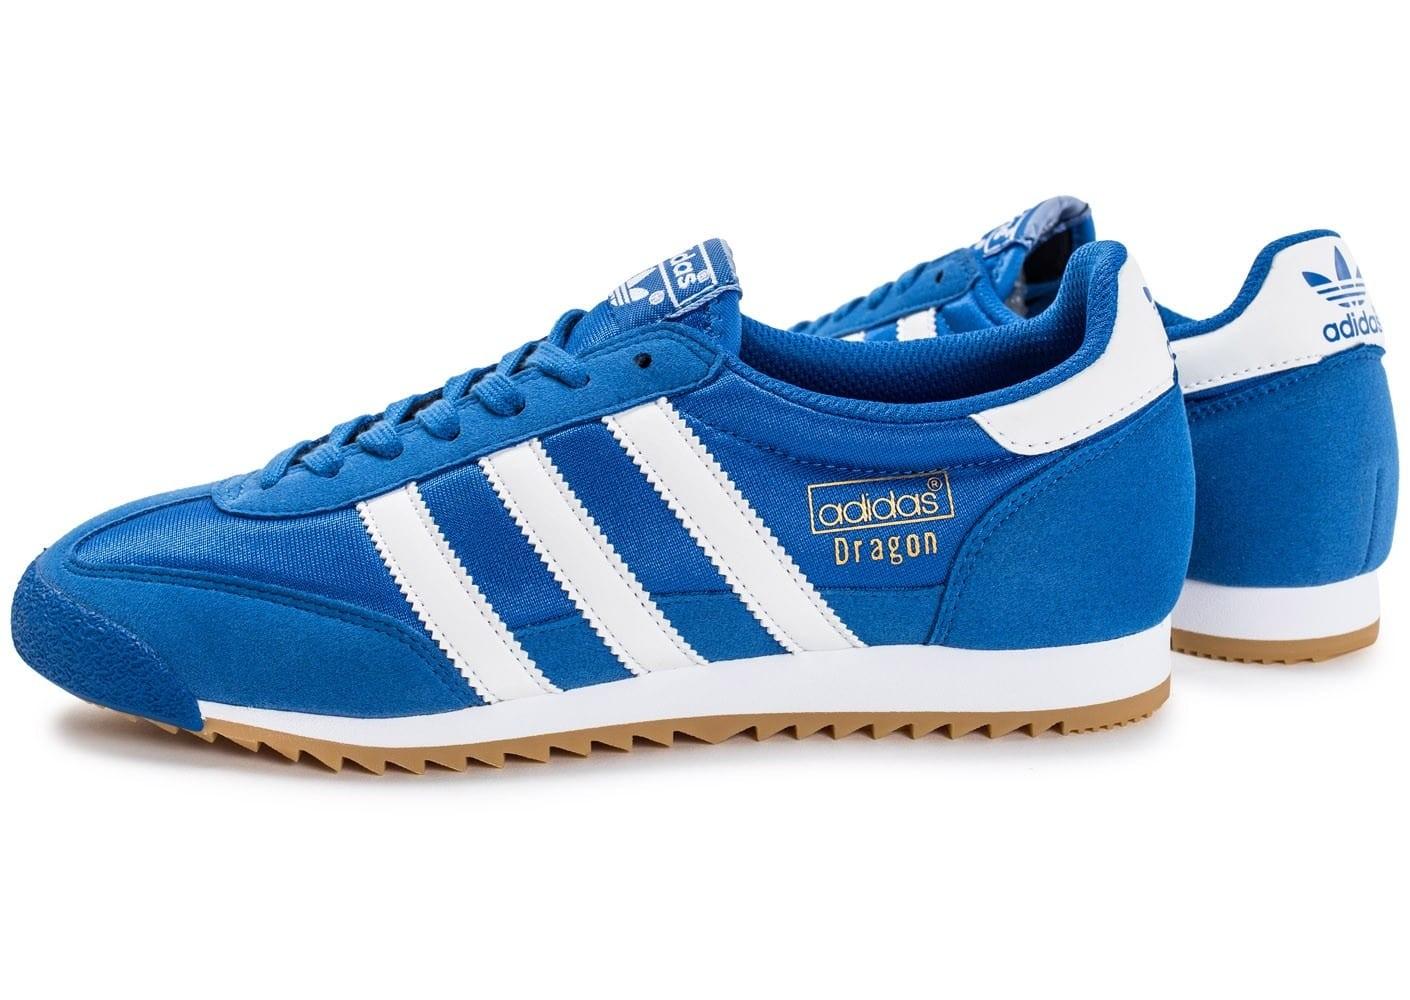 adidas dragon bleu 42